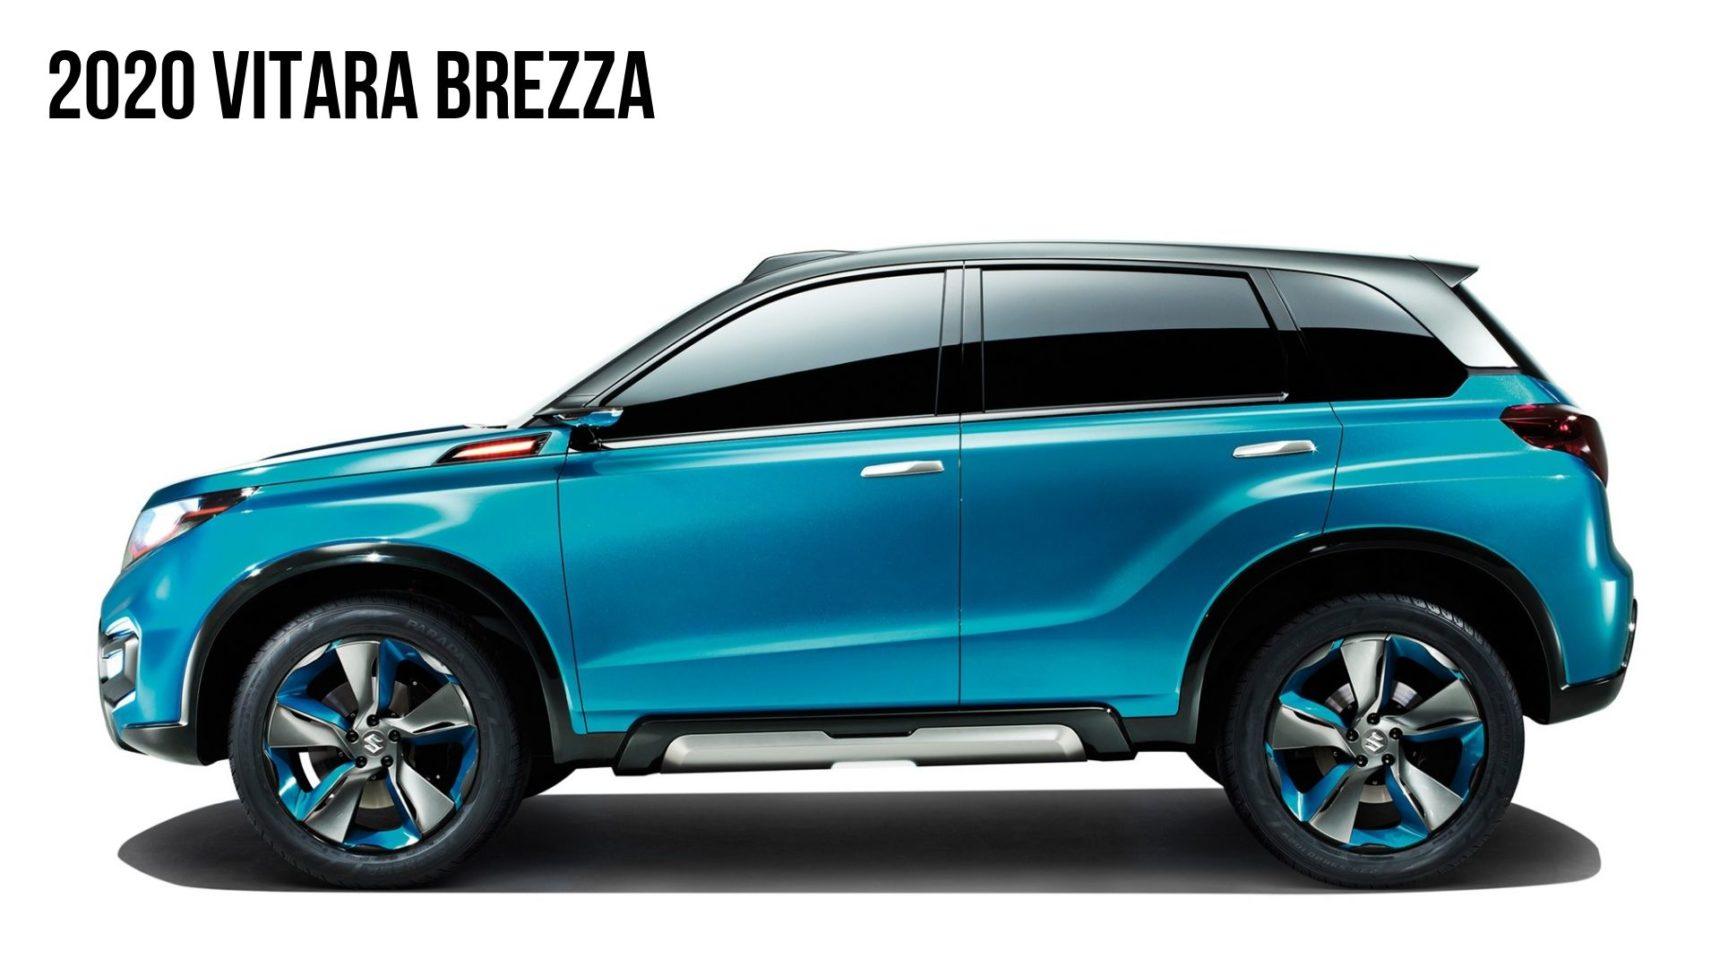 2019 Suzuki Vitara Review, Price, Facelift >> 2020 Maruti Suzuki Vitara Brezza Facelift 5 Expected Changes